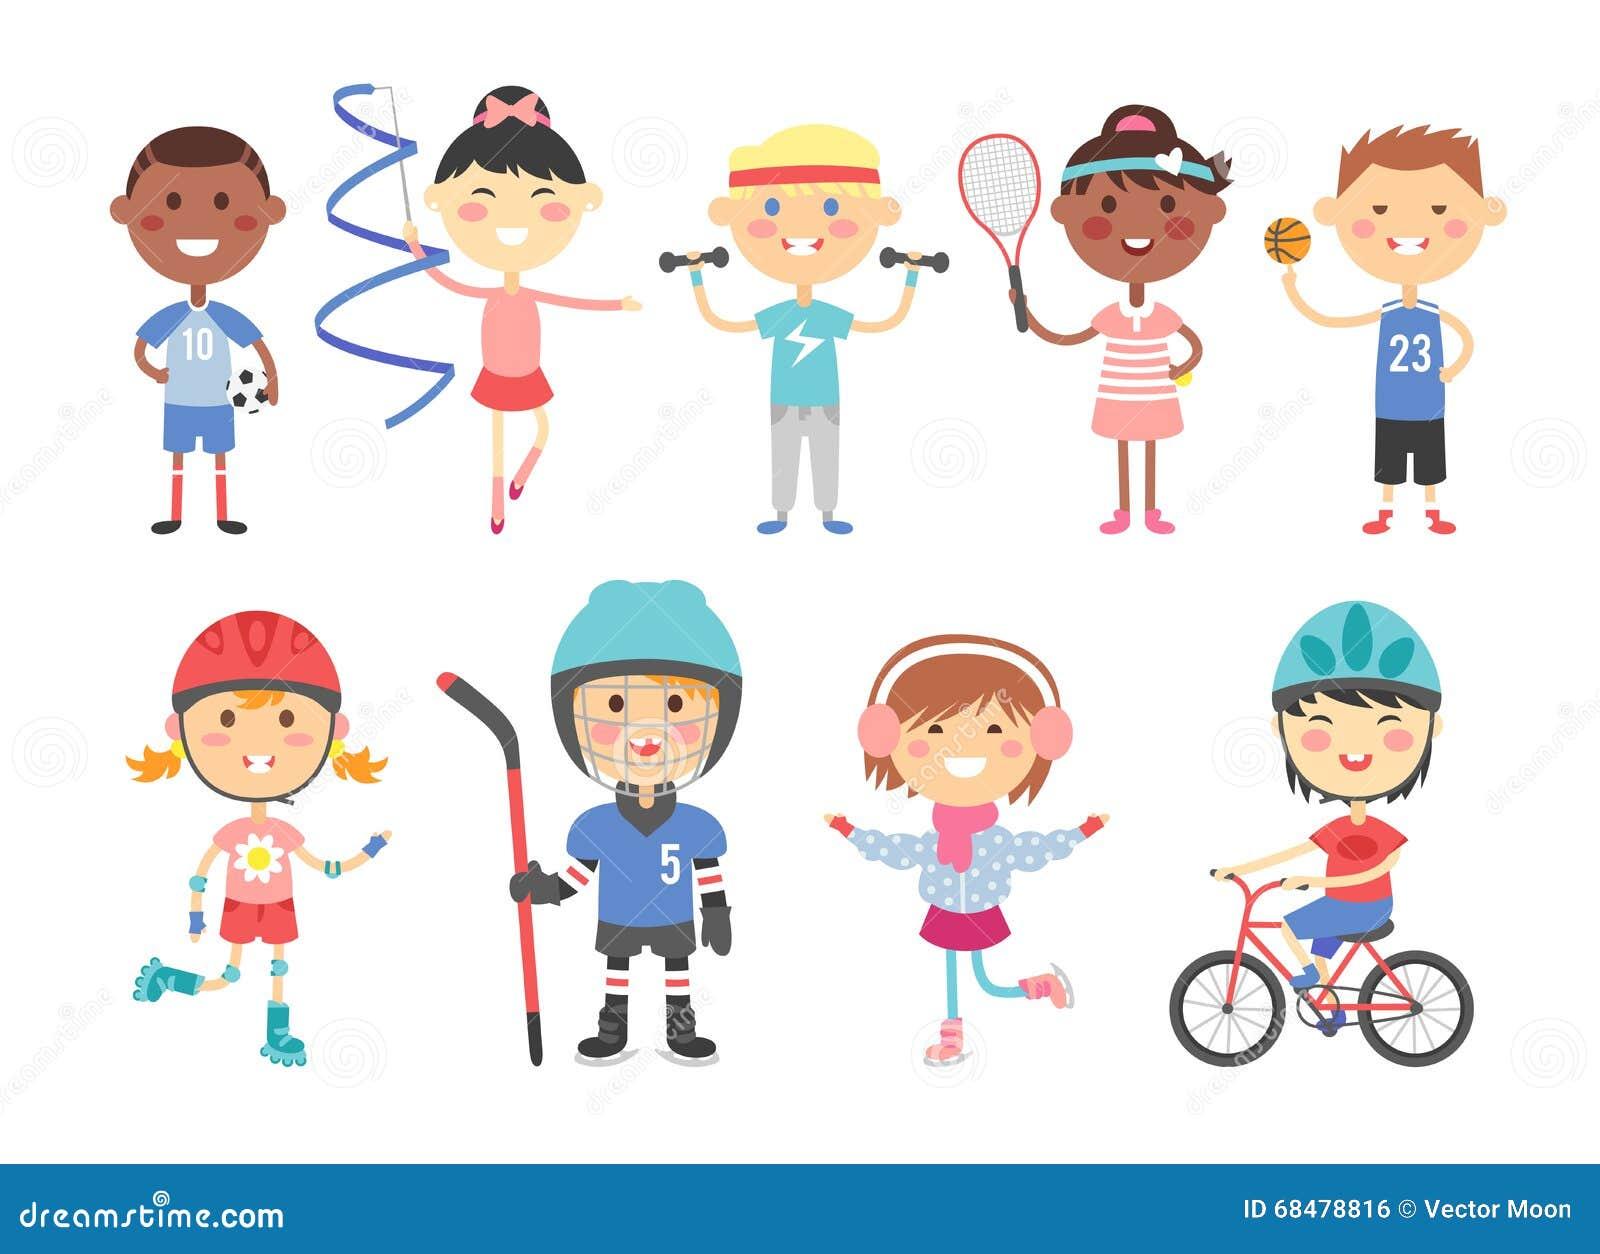 kids sport  boy and girl playing active games vector Baseball Player Clip Art Football Player Clip Art